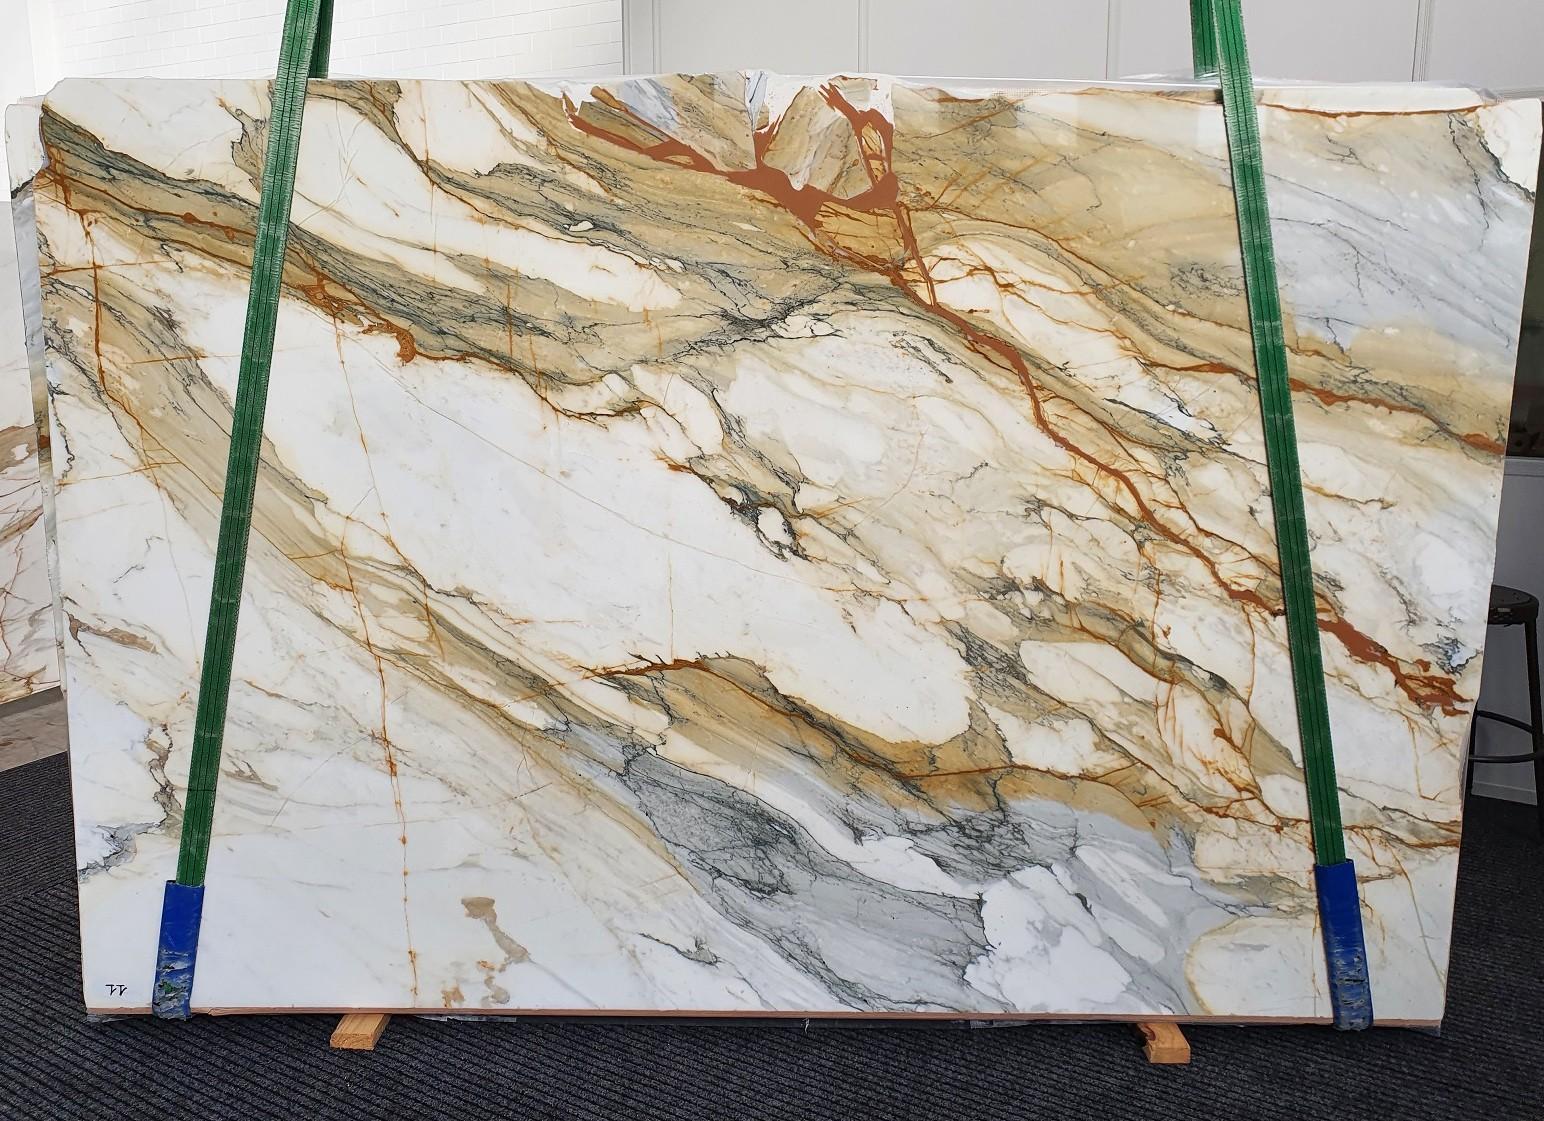 CALACATTA MACCHIAVECCHIA polierte Unmaßplatten 1422 aus Natur Marmor , Slab #11: Lieferung Veneto, Italien